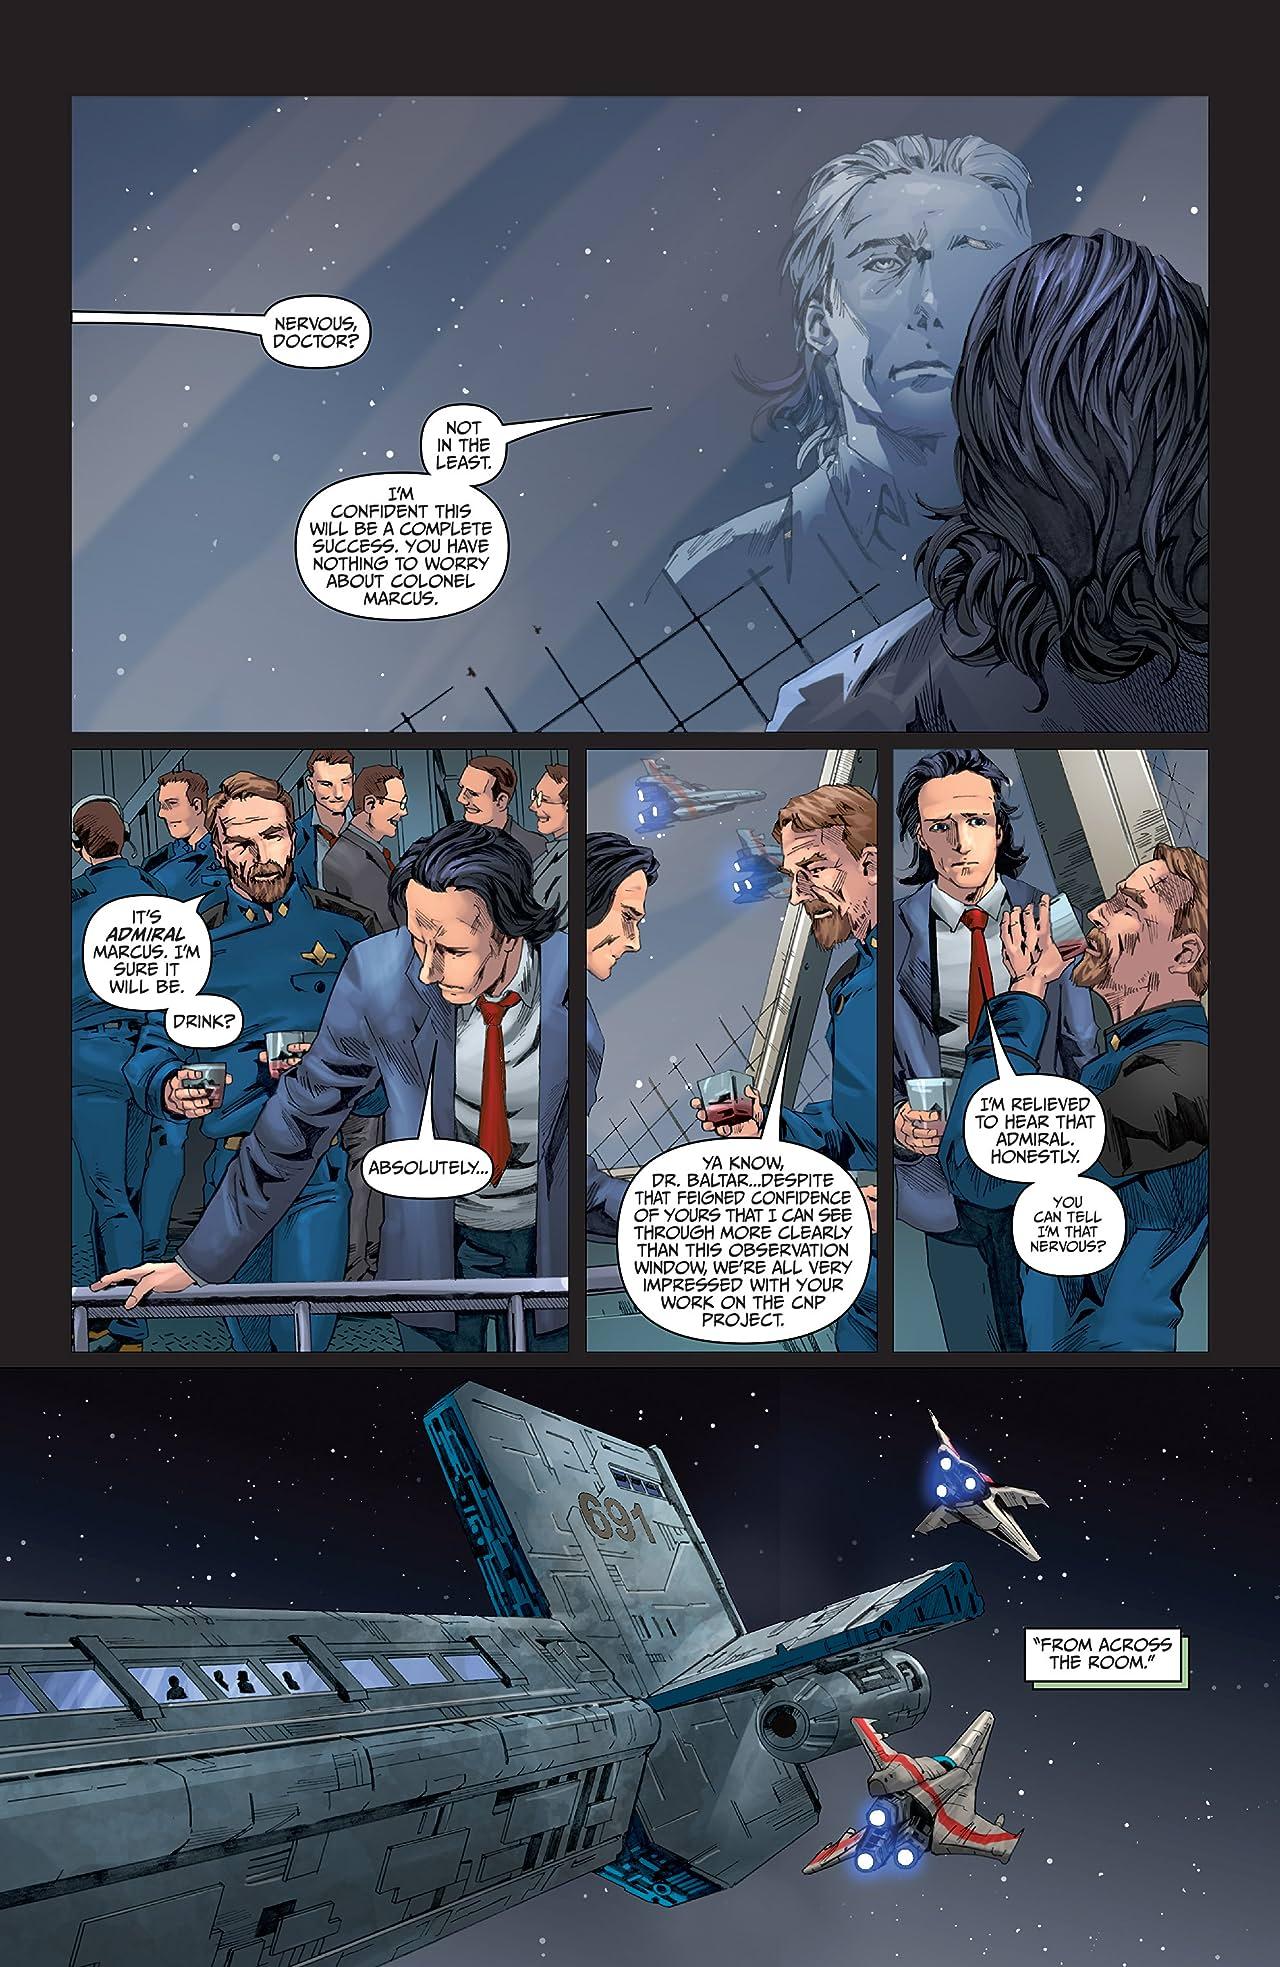 Battlestar Galactica: Origins #4